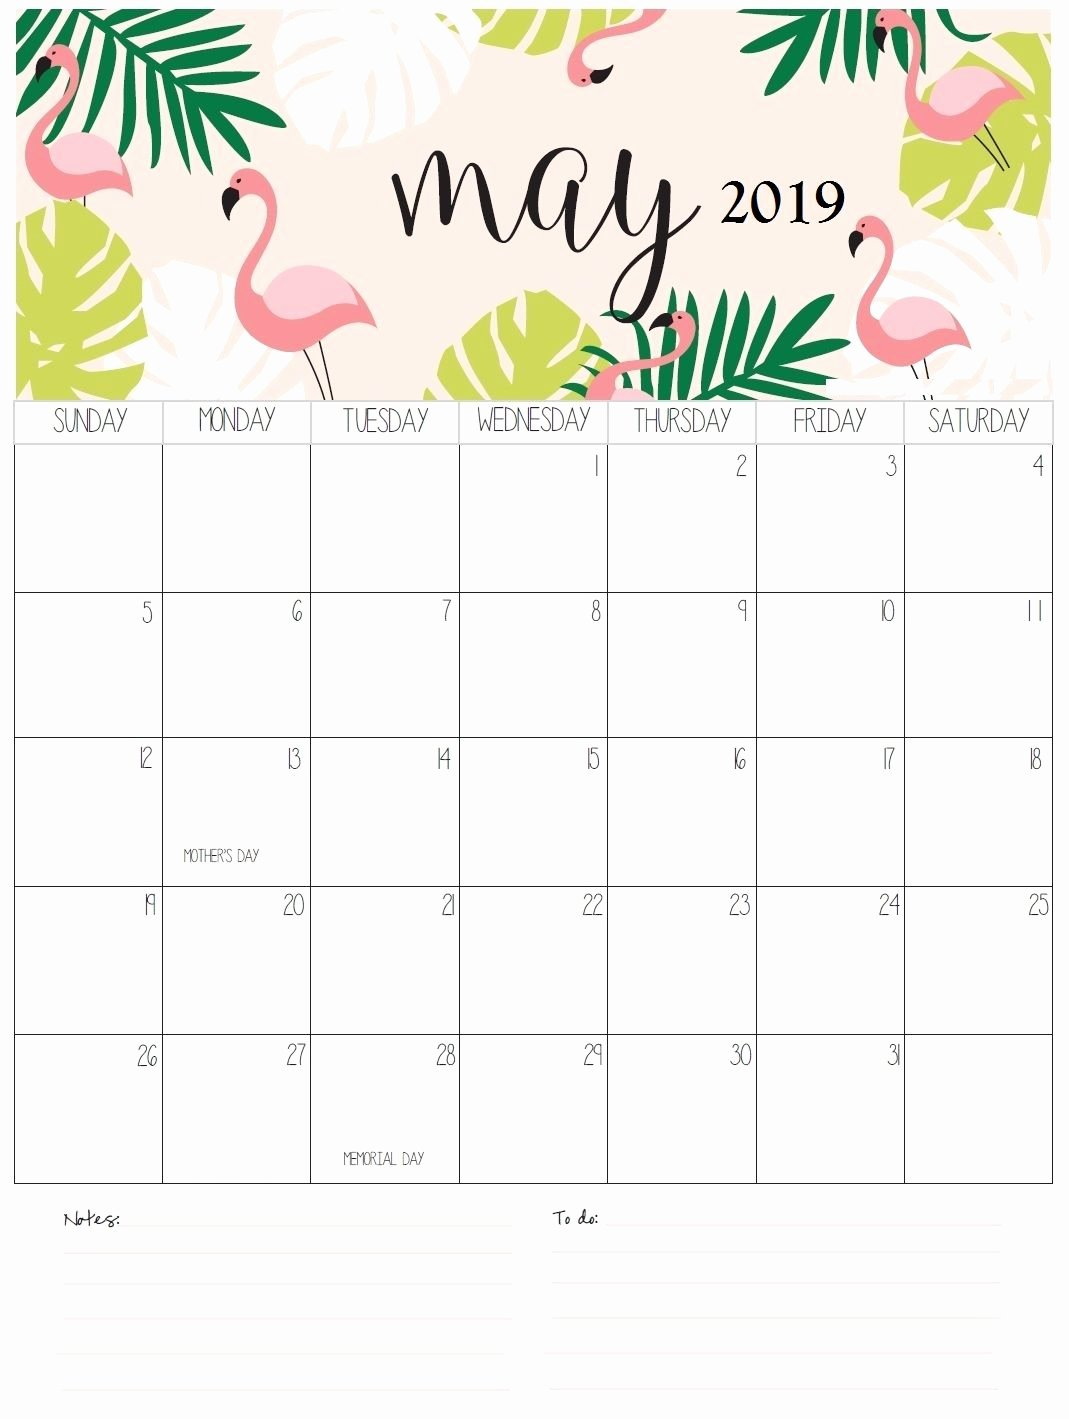 Cute Calendar Template 2019 New Personalized May Calendar 2019 May May2019